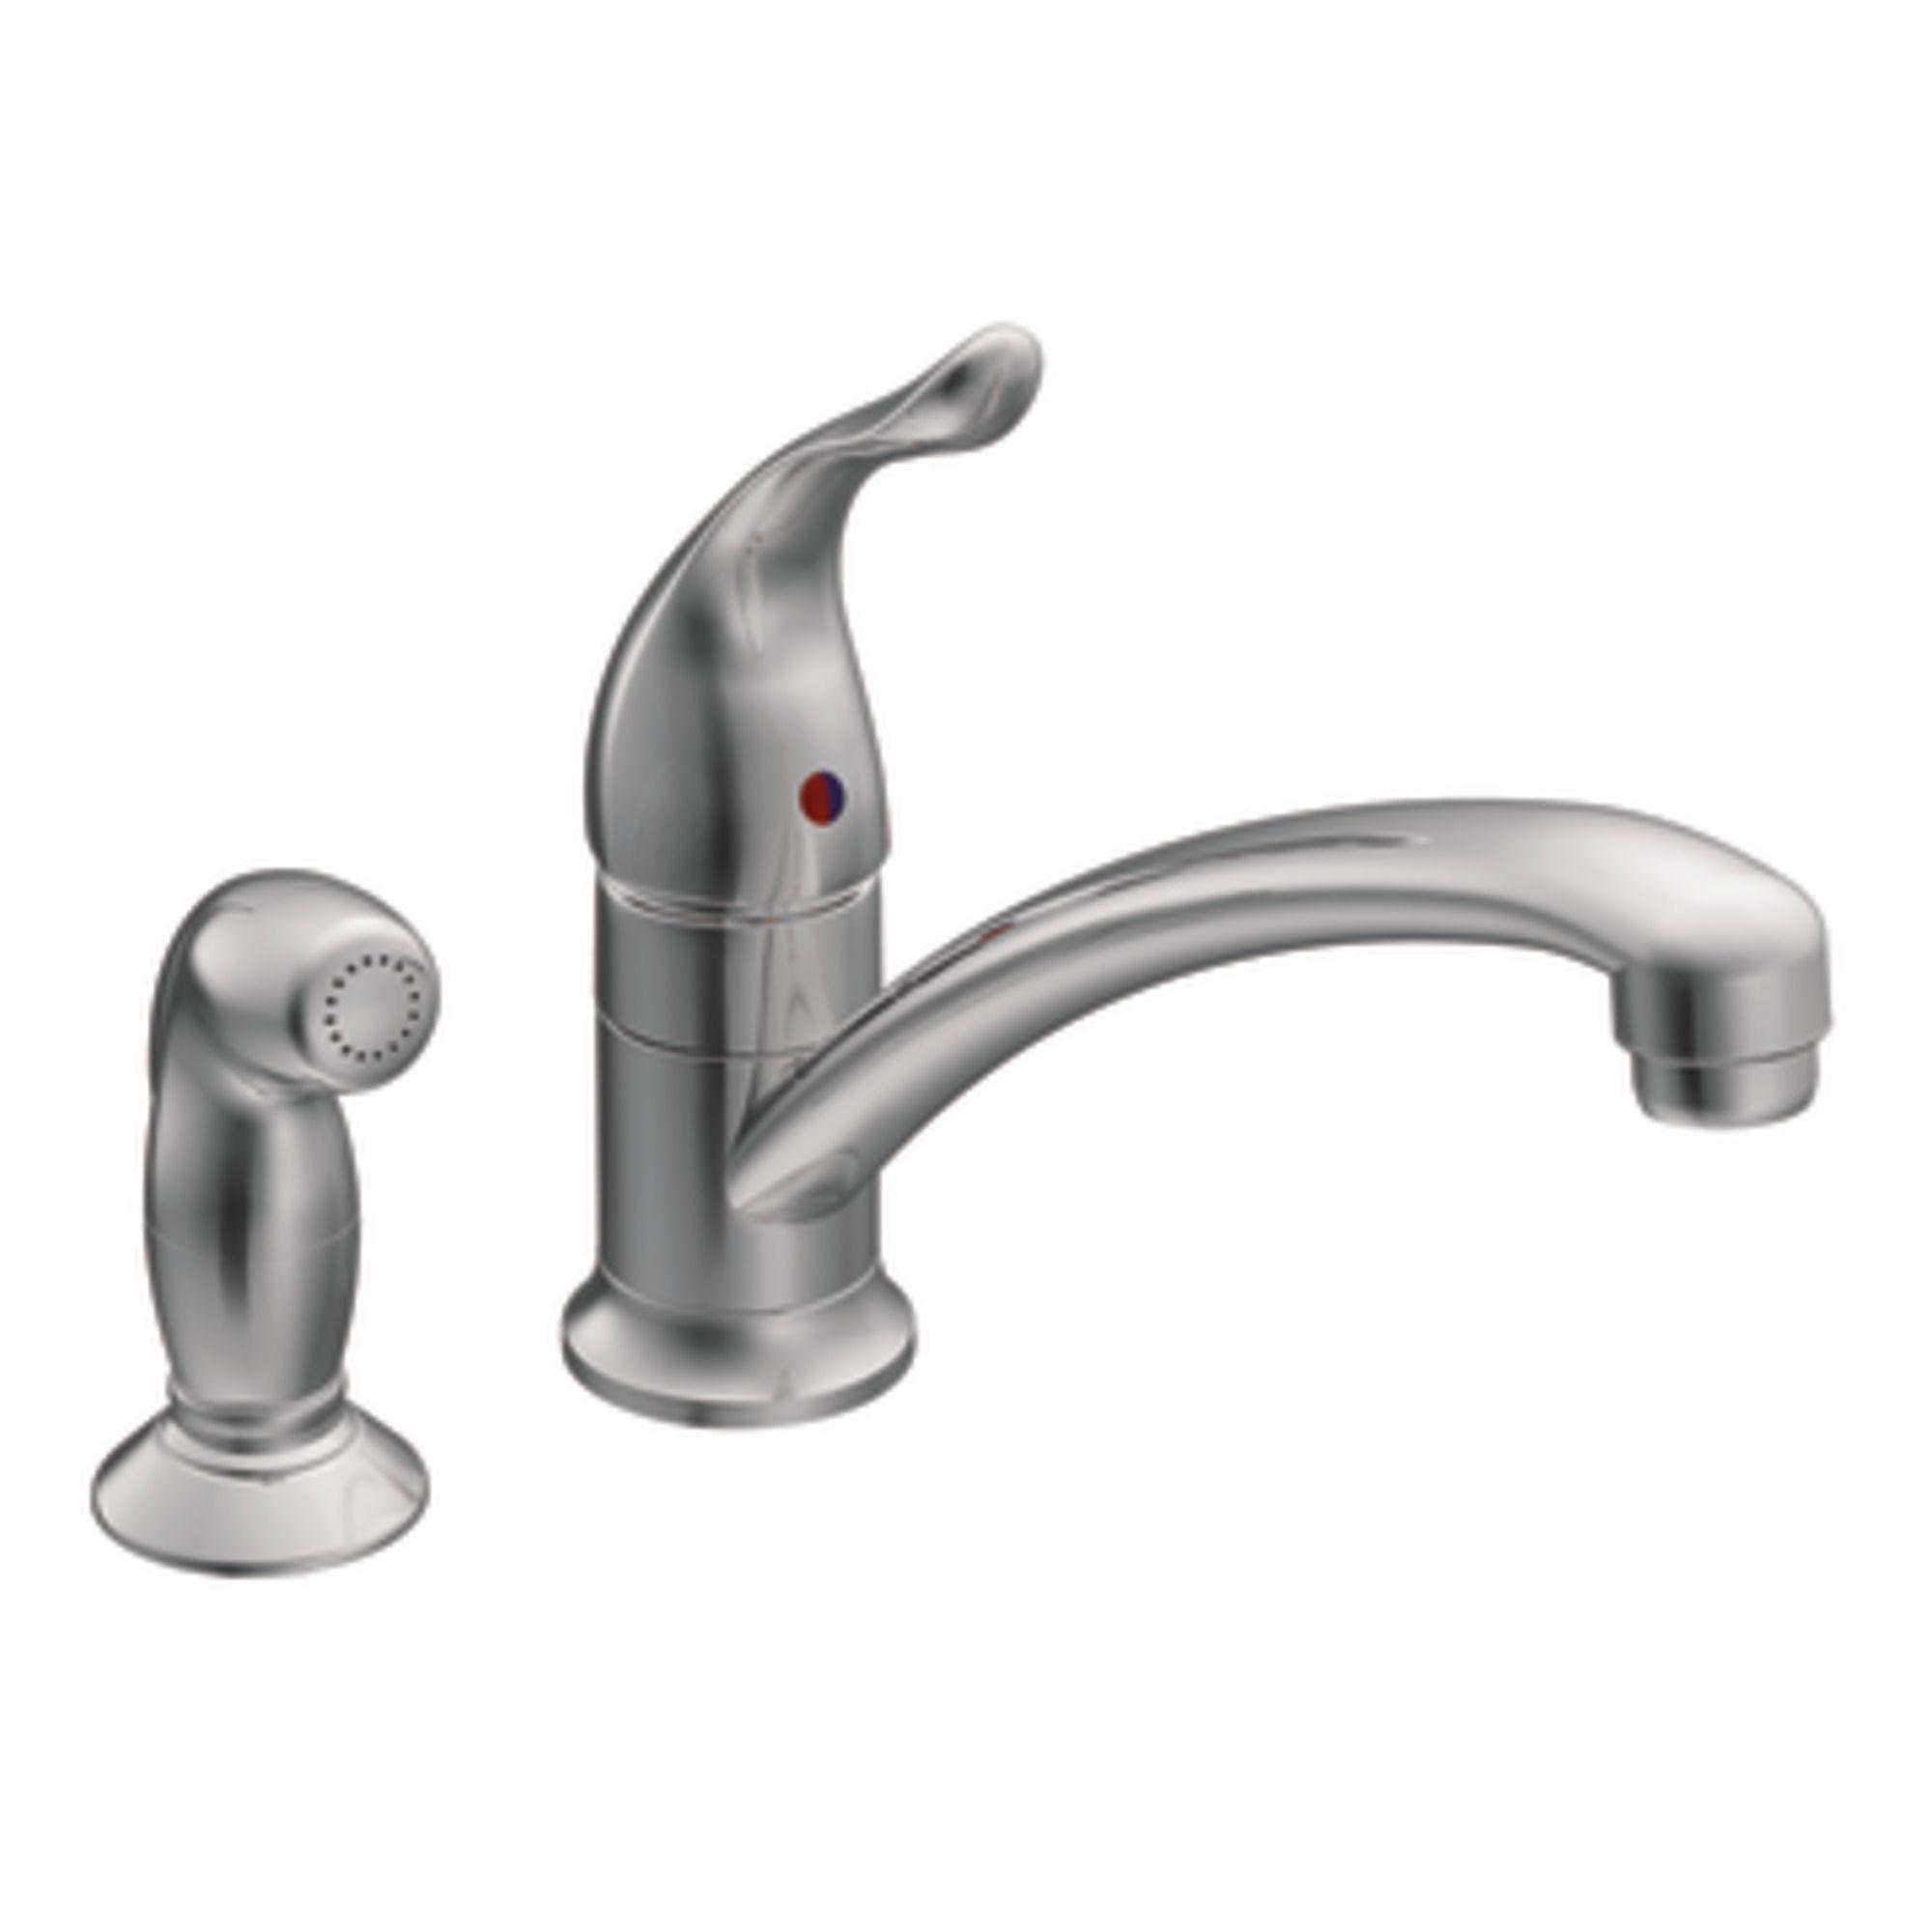 Chateau Series Single Handle Kitchen Faucet Click To Enlarge Awesome Single Handle Kitchen Faucet Inspiration Design